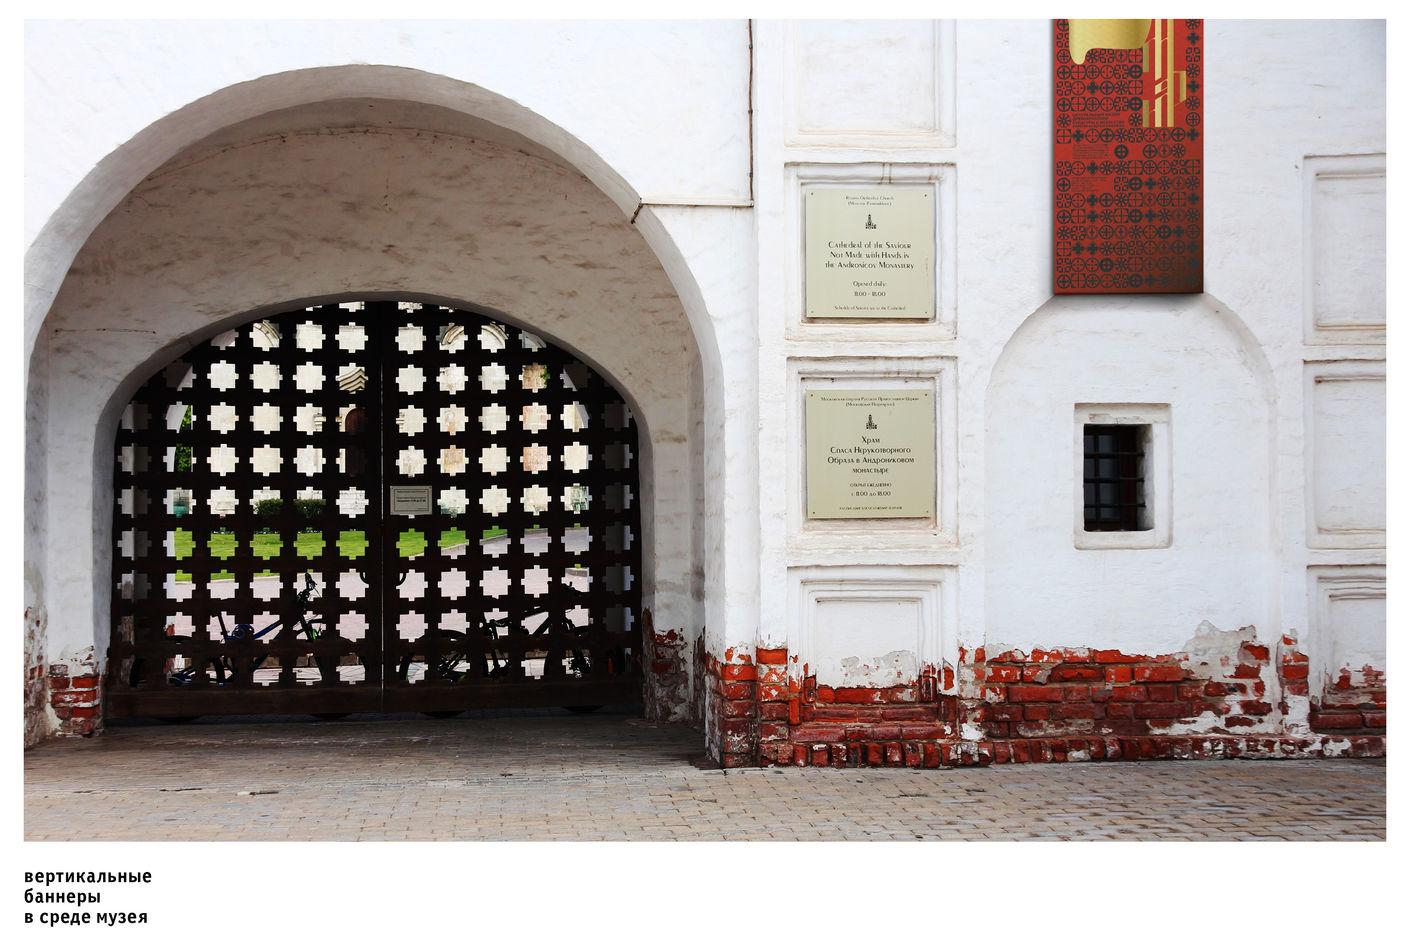 Брендинг Музея Андрея Рублева Лаборатория дизайна НИУ ВШЭ - hsedesignlab.ru